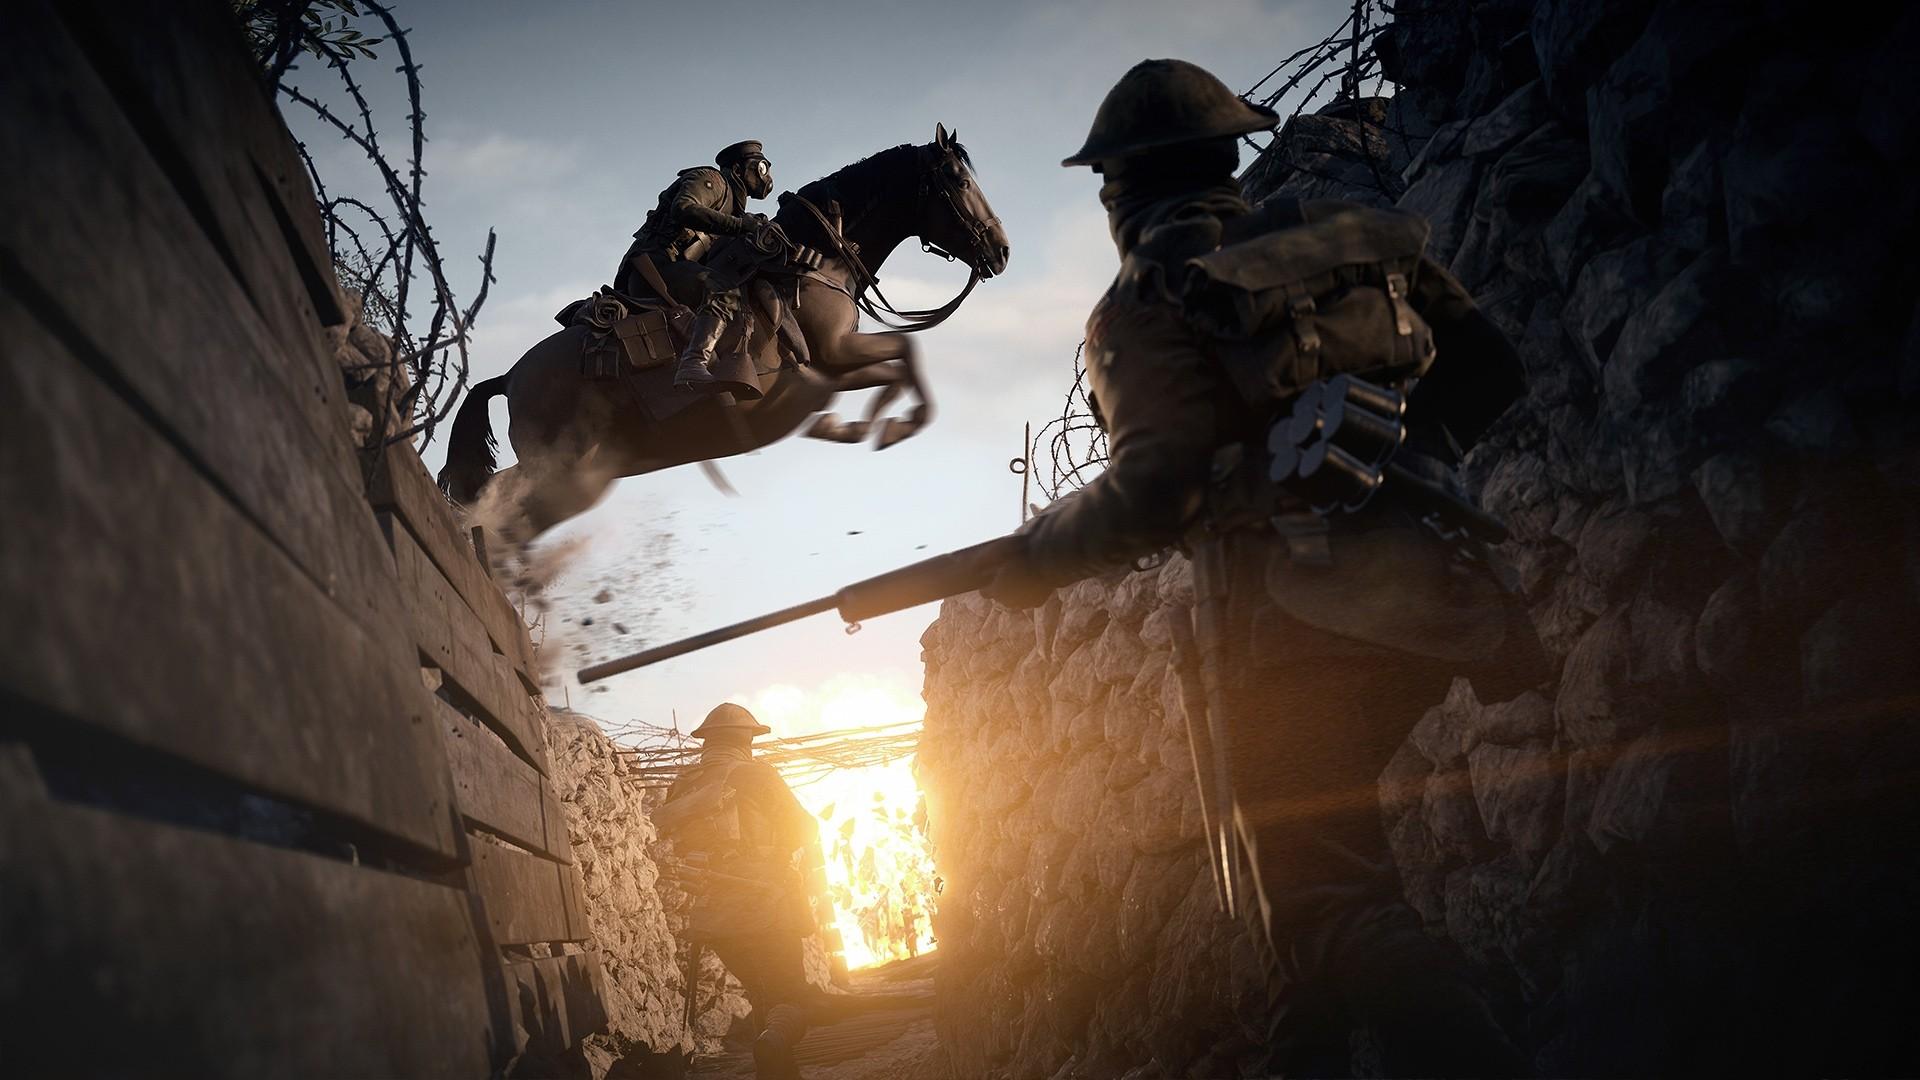 Battlefield 1 Background Wallpaper HD